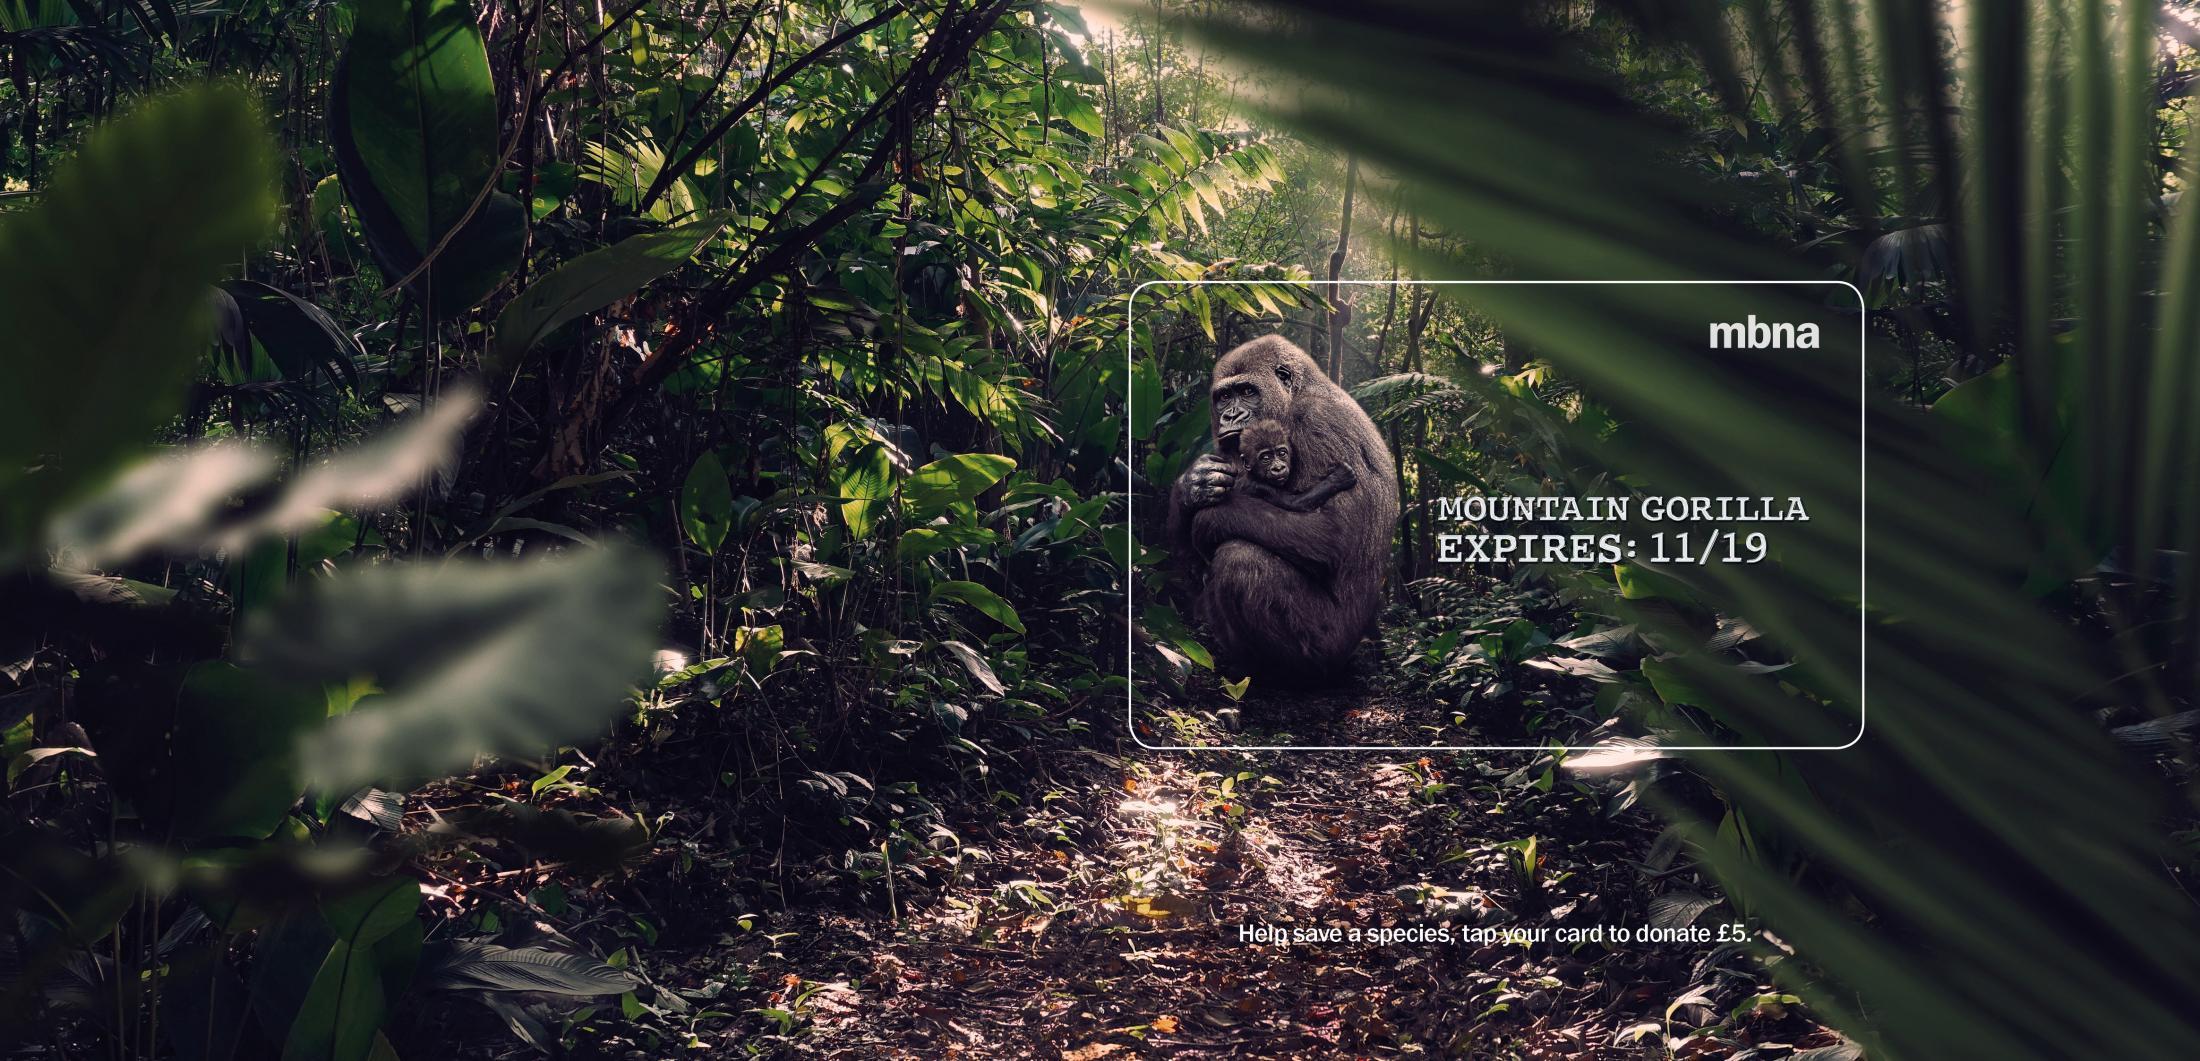 MBNA Outdoor Ad - Expires - Gorilla